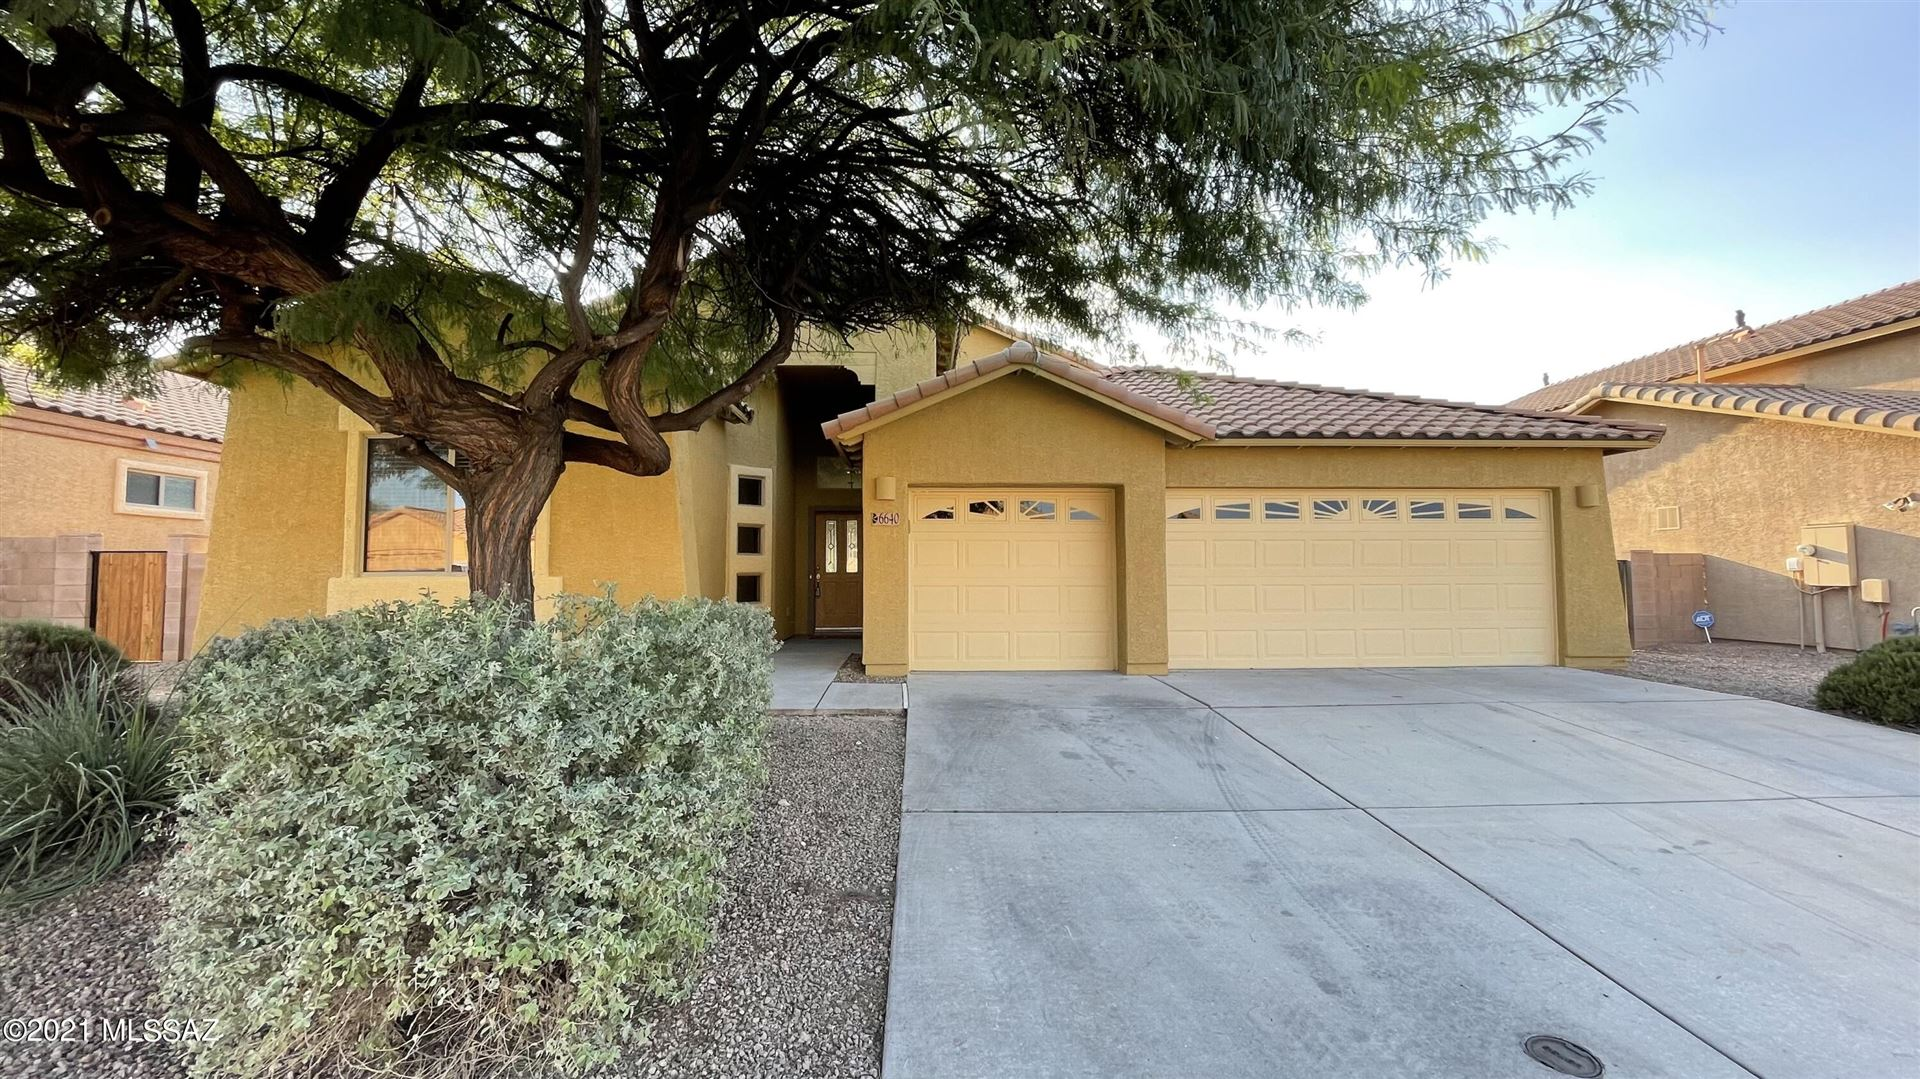 6640 S Lantana Vista Drive, Tucson, AZ 85756 - MLS#: 22123421